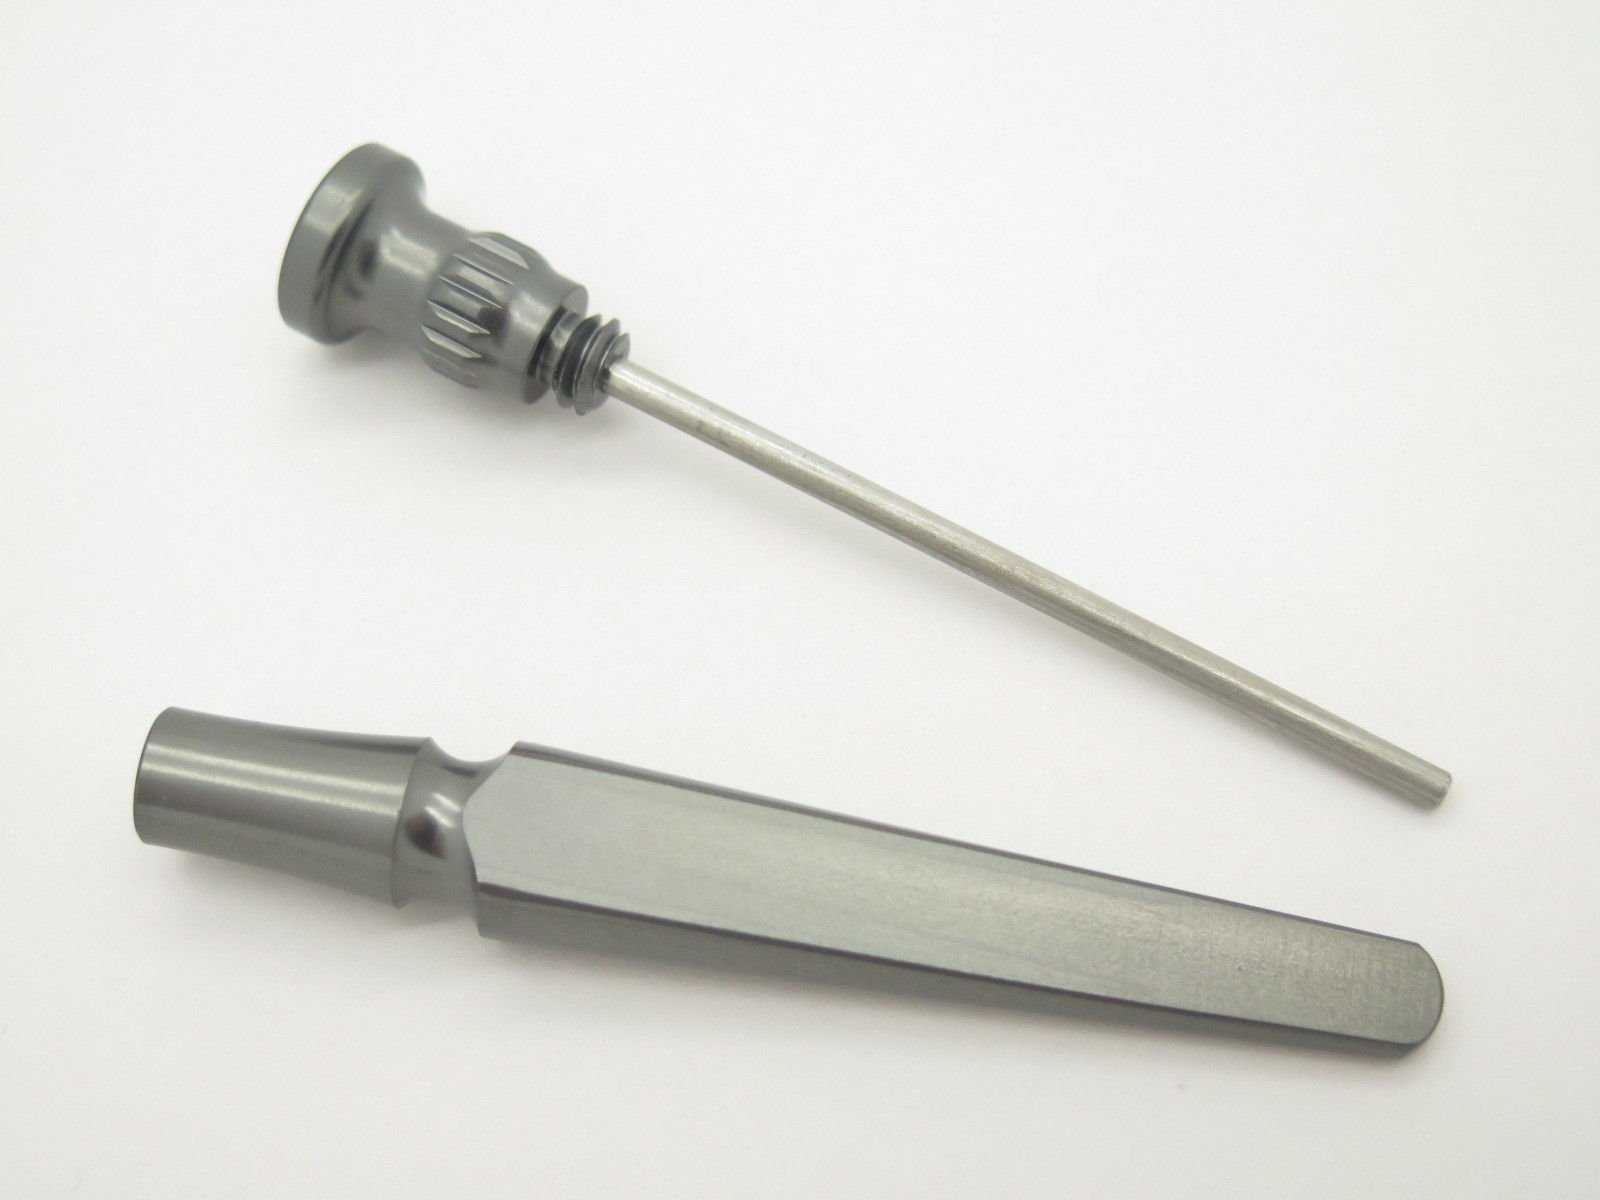 Legion Tobacco Pipe Tool 3 in 1 PLATINUM GRAY Aluminum Tamper Reamer Stainless Steel Pick USA